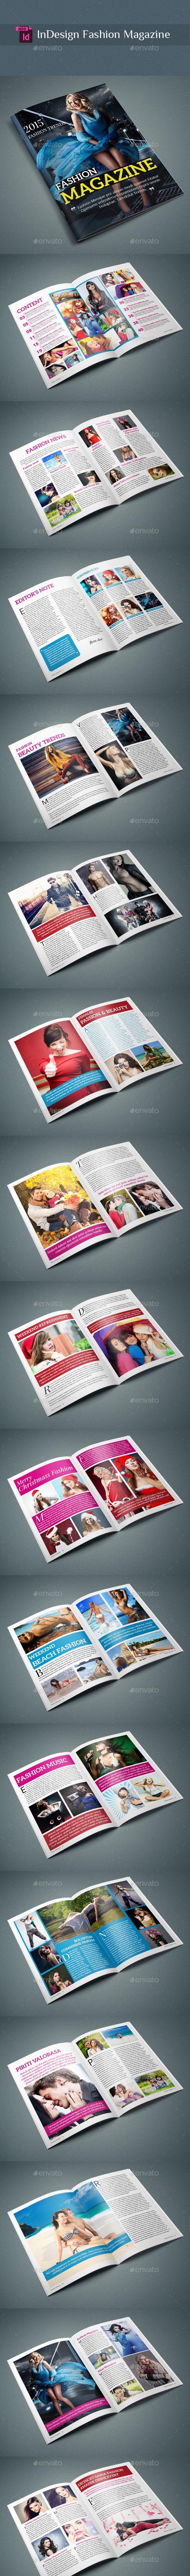 InDesign Fashion Magazine - Magazines Print Templates